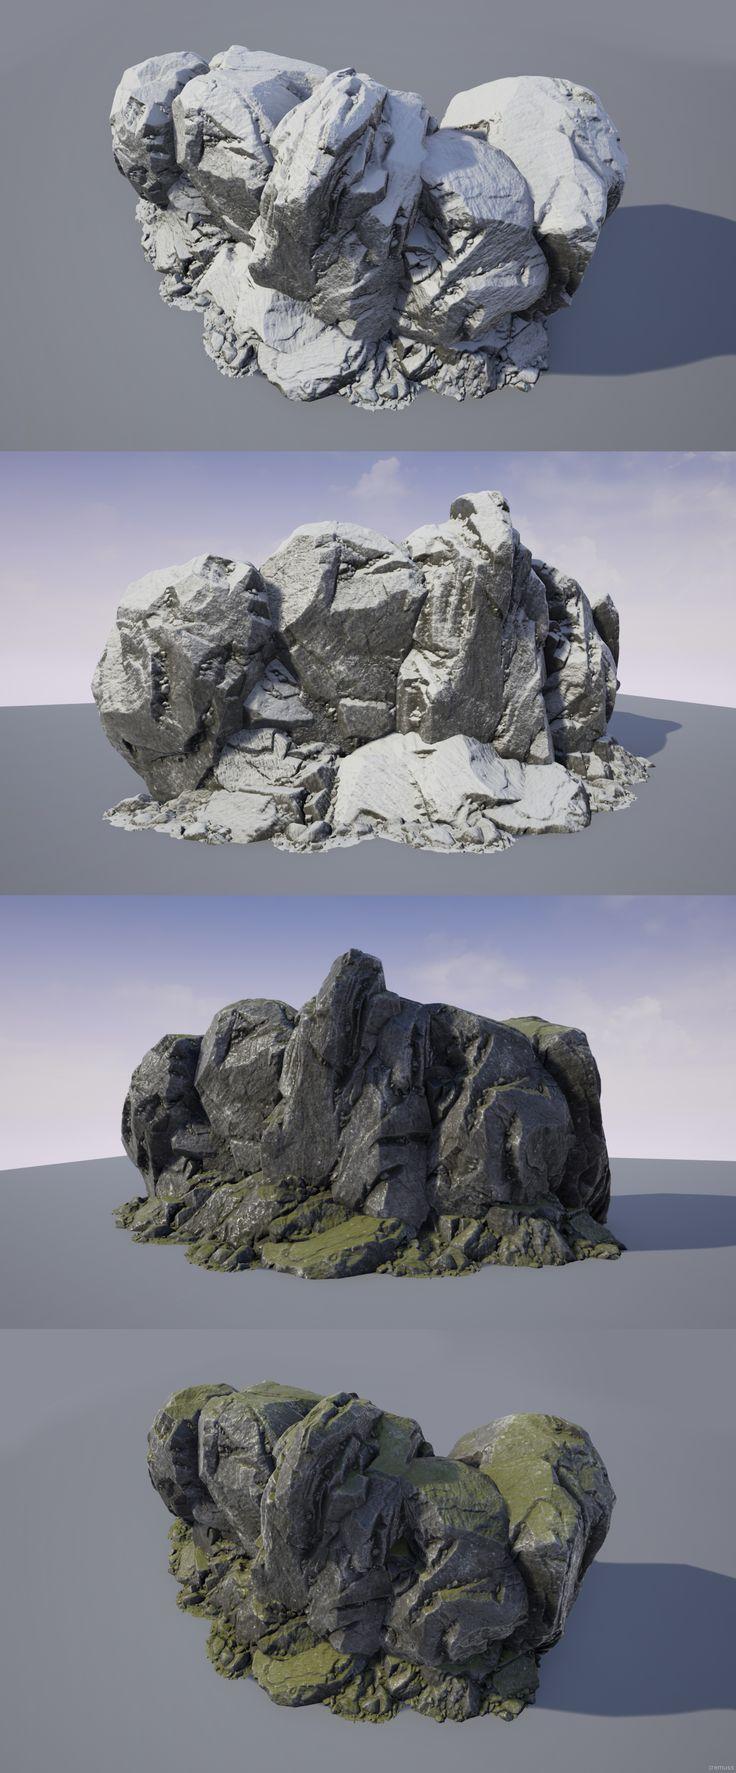 Image: http://cremuss.net/3d/wip/RockSculpting_WIP_3b.jpg